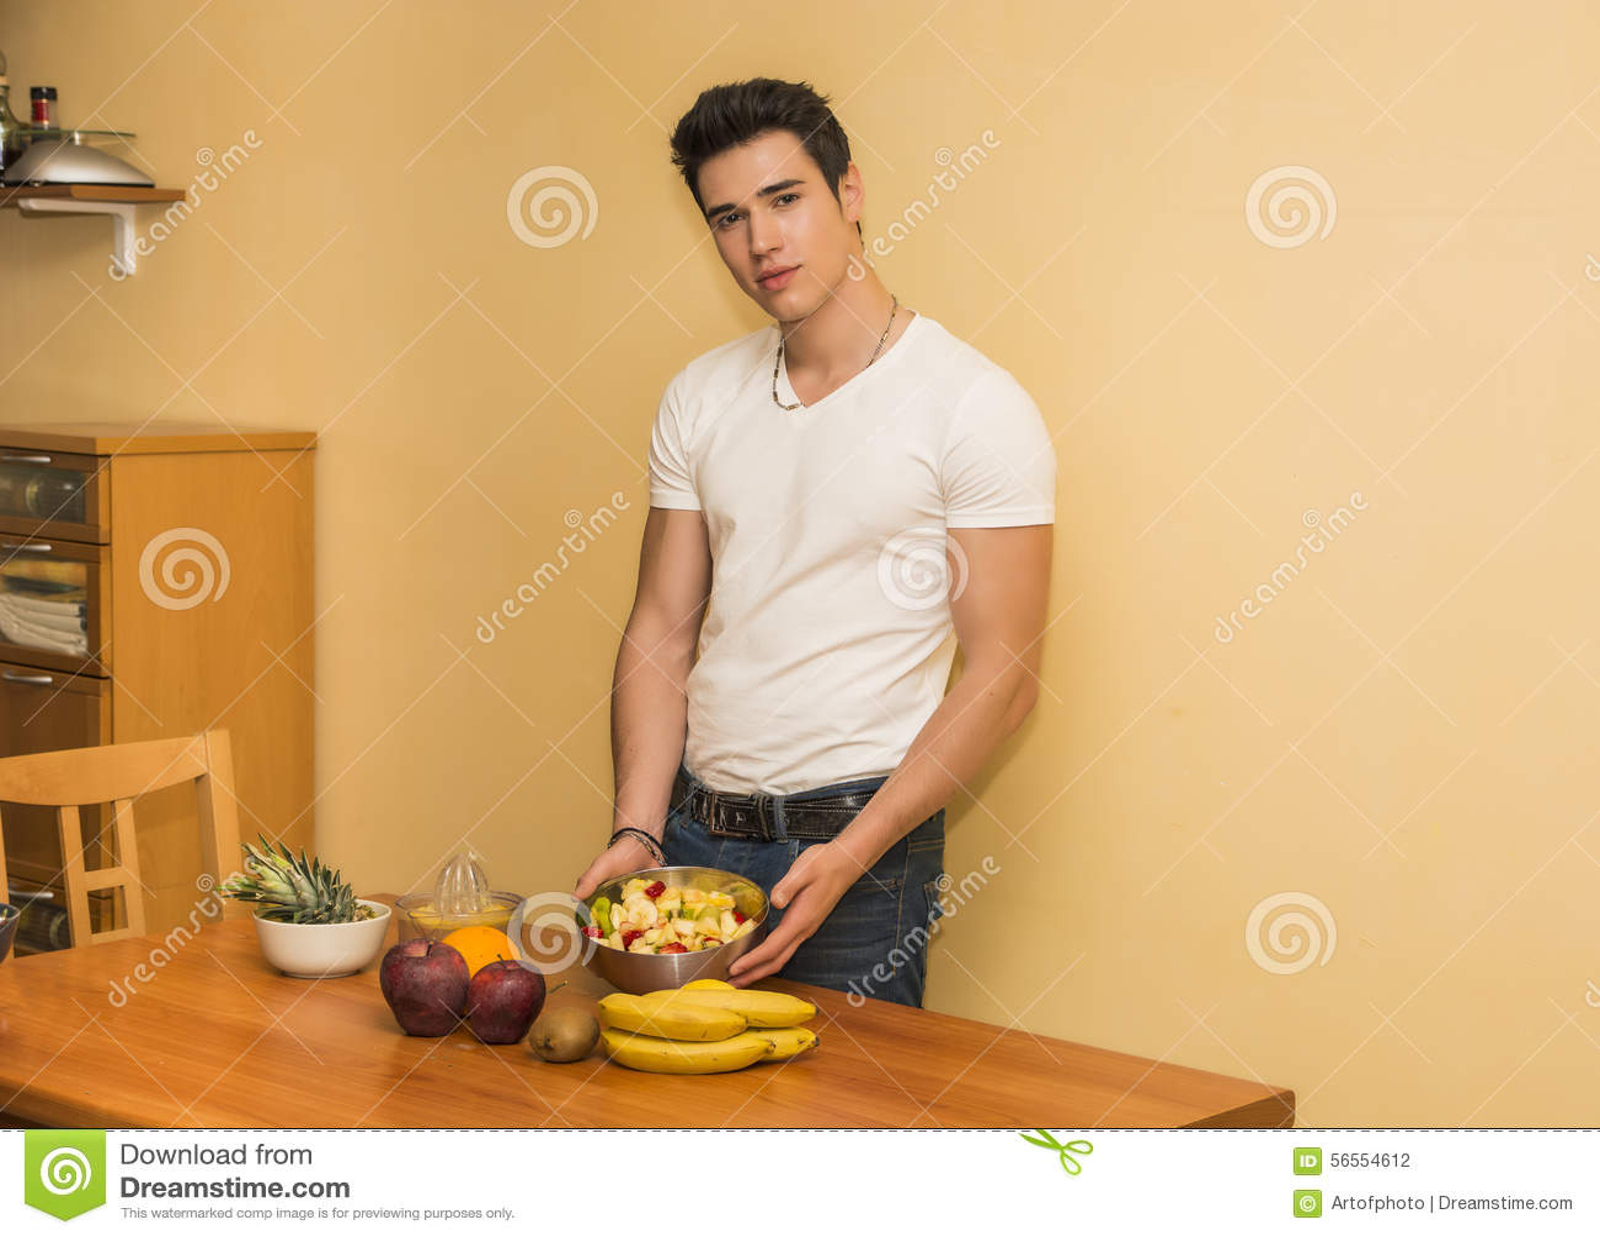 Download Νεαρός άνδρας που προετοιμάζει μια σαλάτα ή έναν καταφερτζή φρούτων Στοκ Εικόνες - εικόνα από ανανάς, τακτοποίηση: 56554612